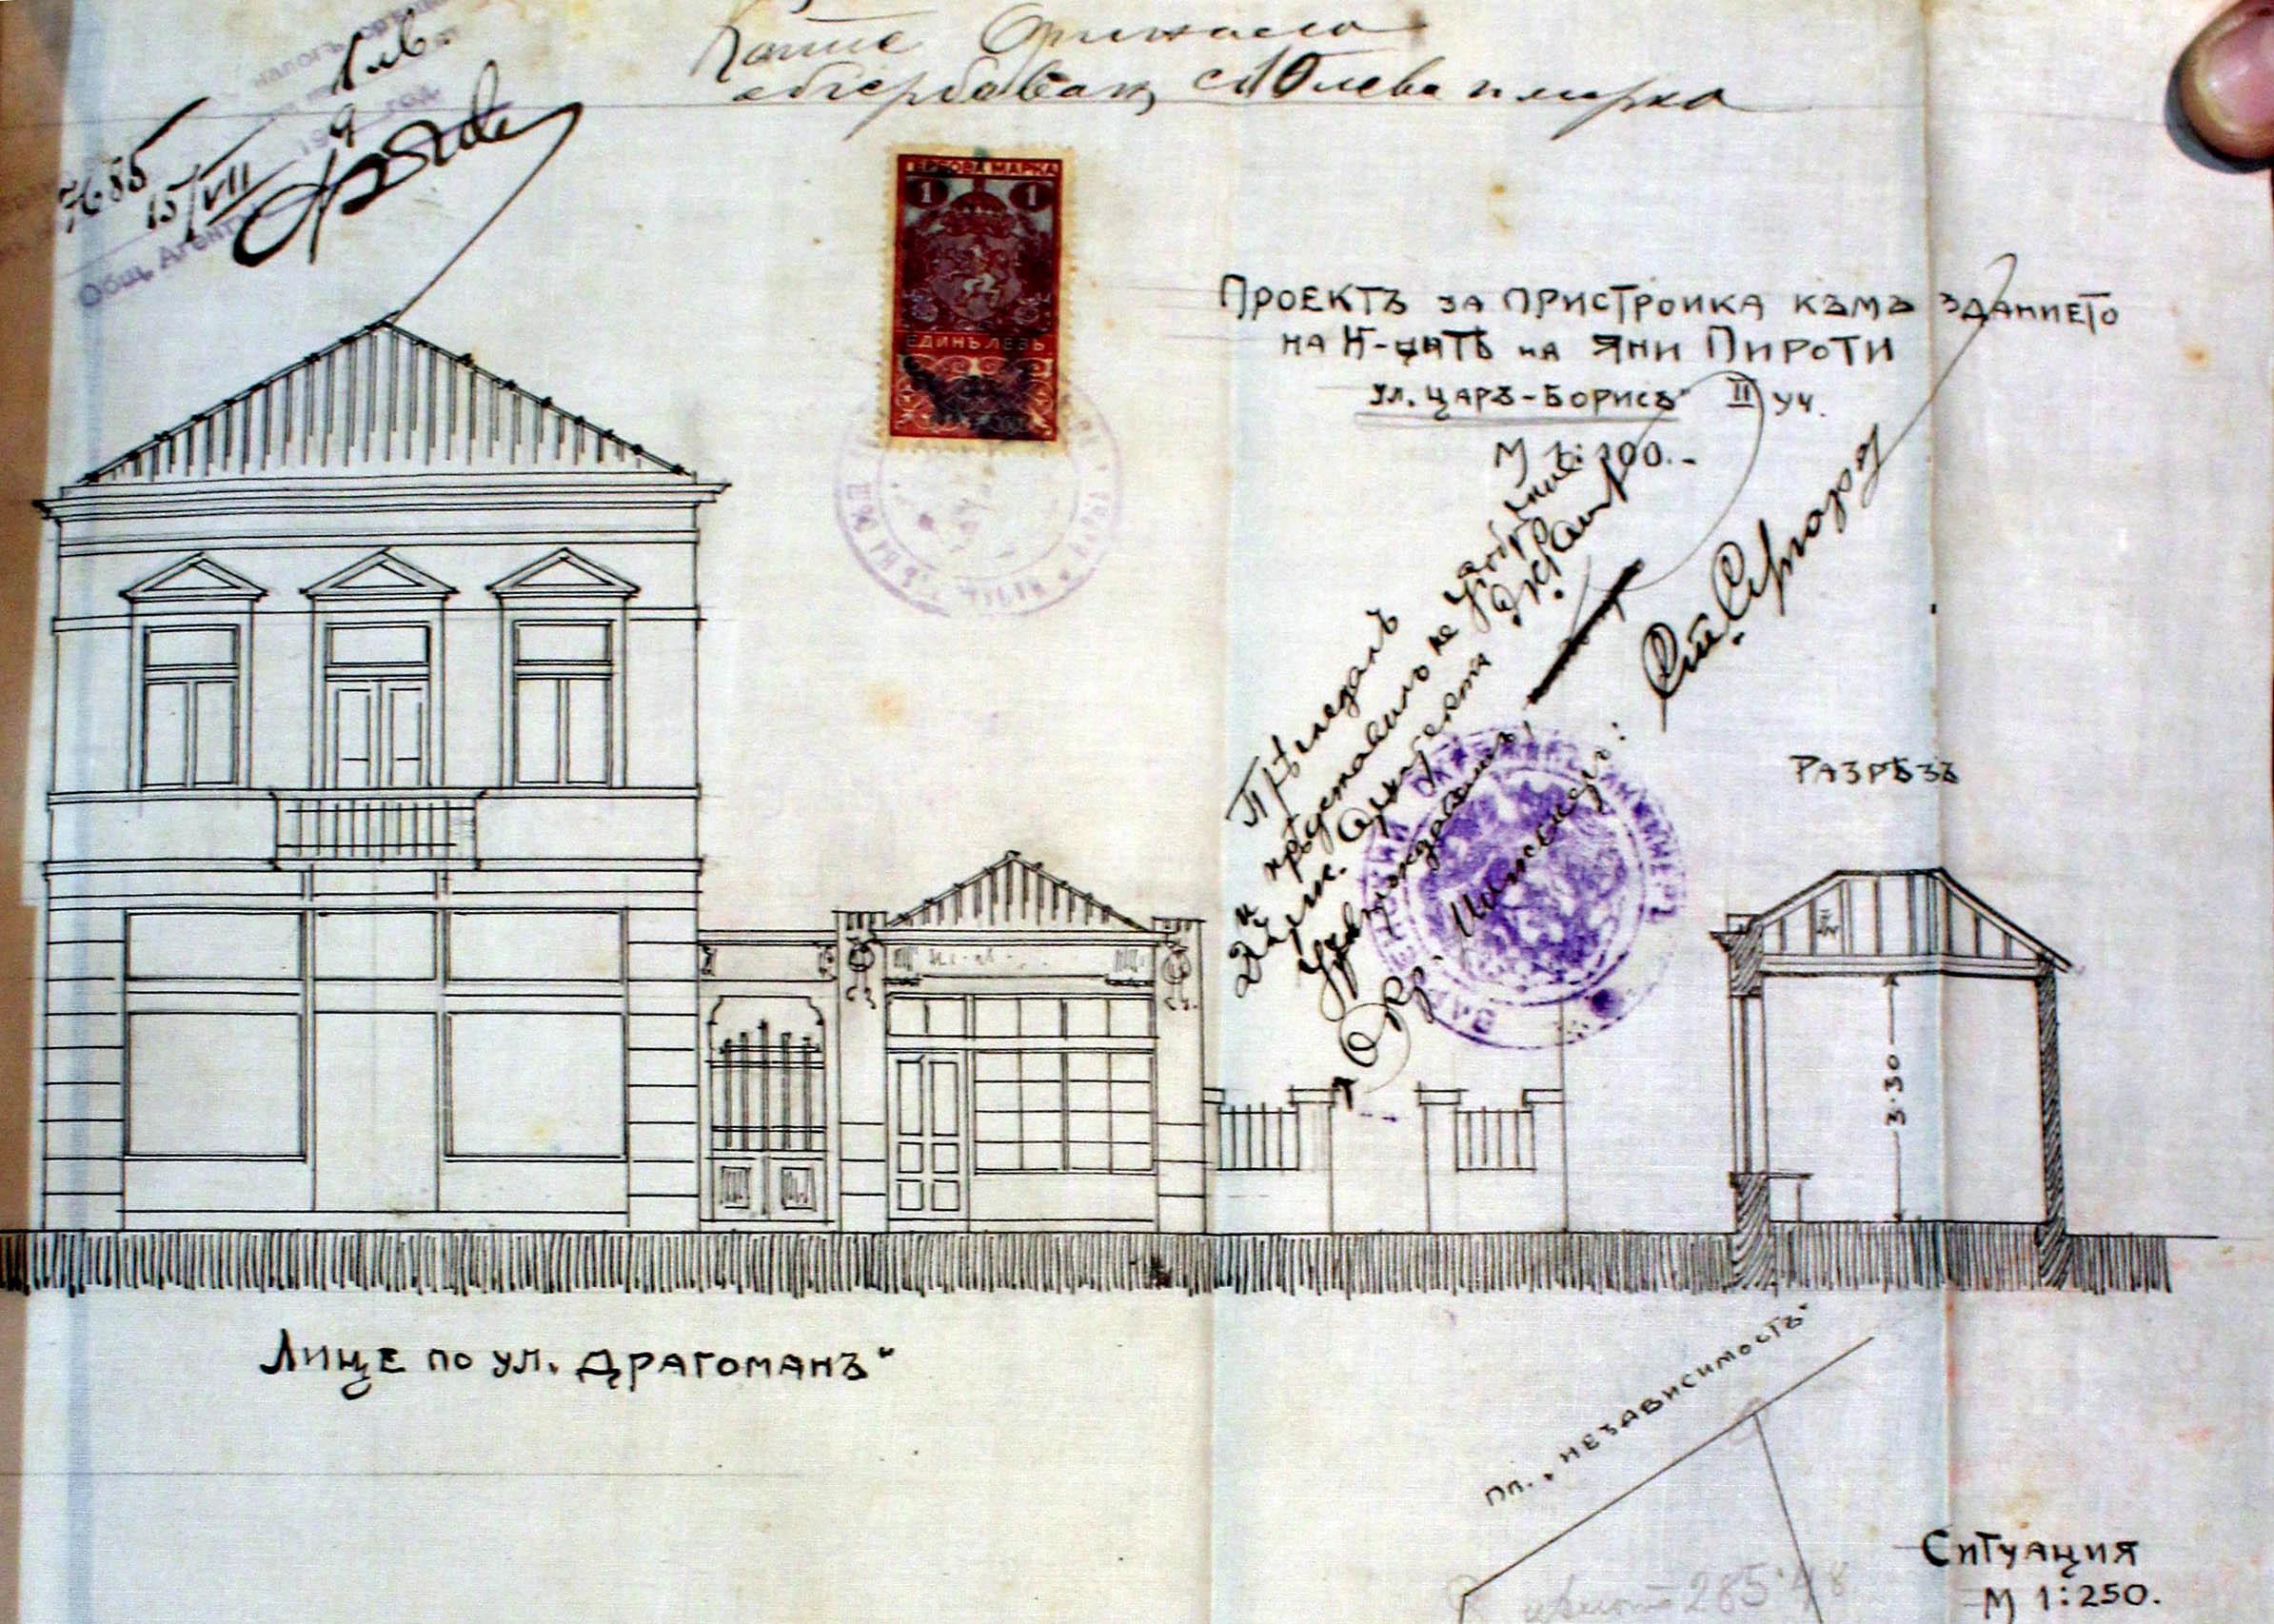 Проект за пристройка - 1919г. /изт.:Архив-Община Варна/